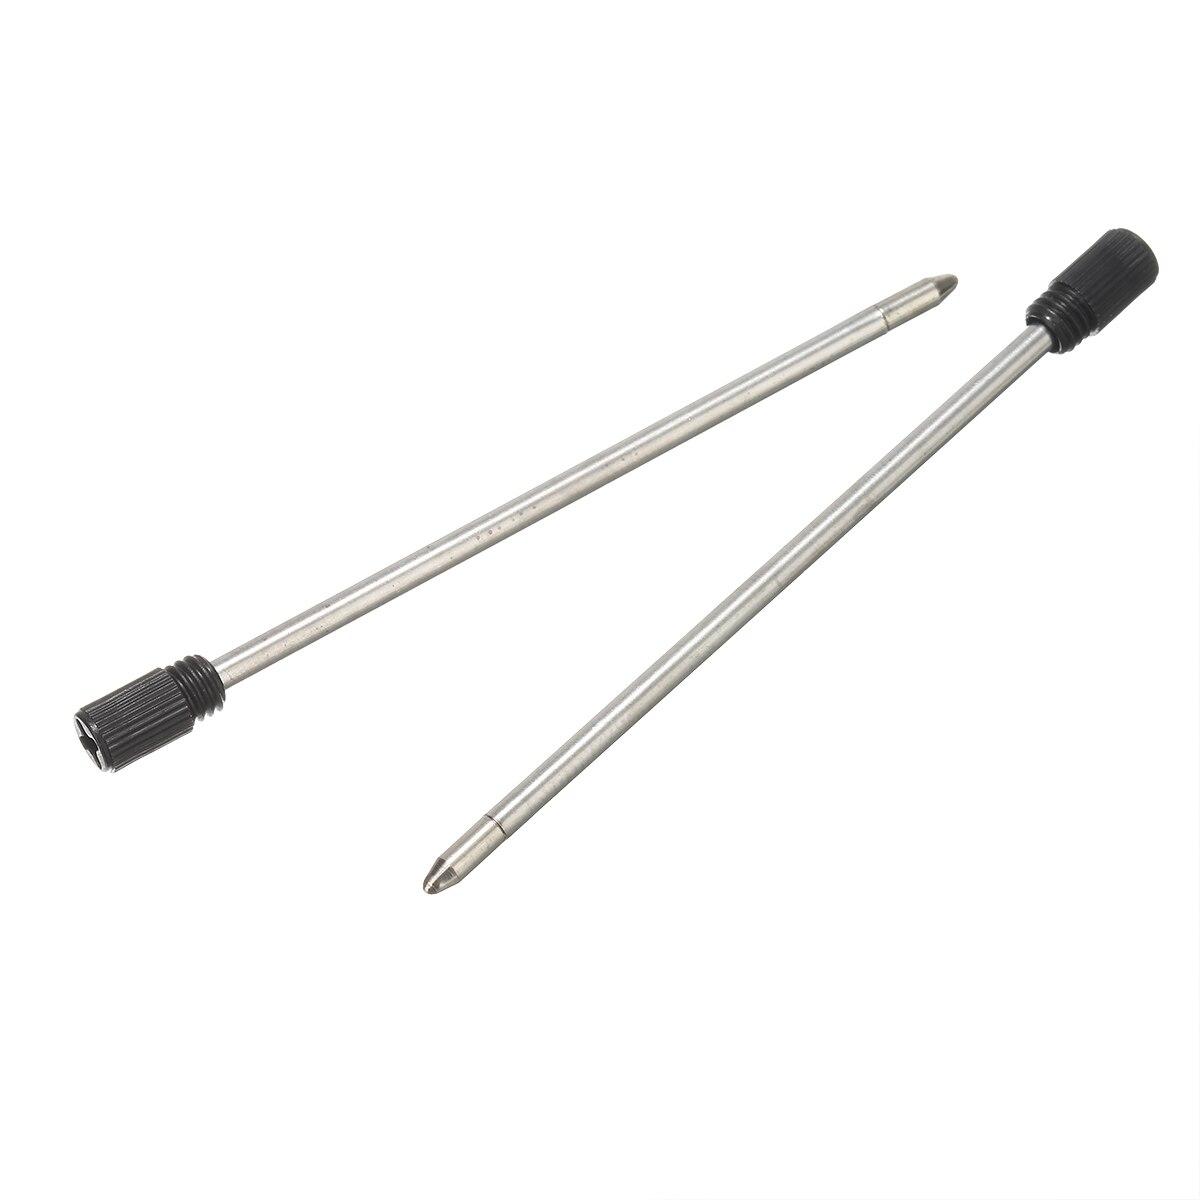 10Pcs 70mm Black Metal Element Crystal Ink Ballpoint Replace Refill Pen Tool